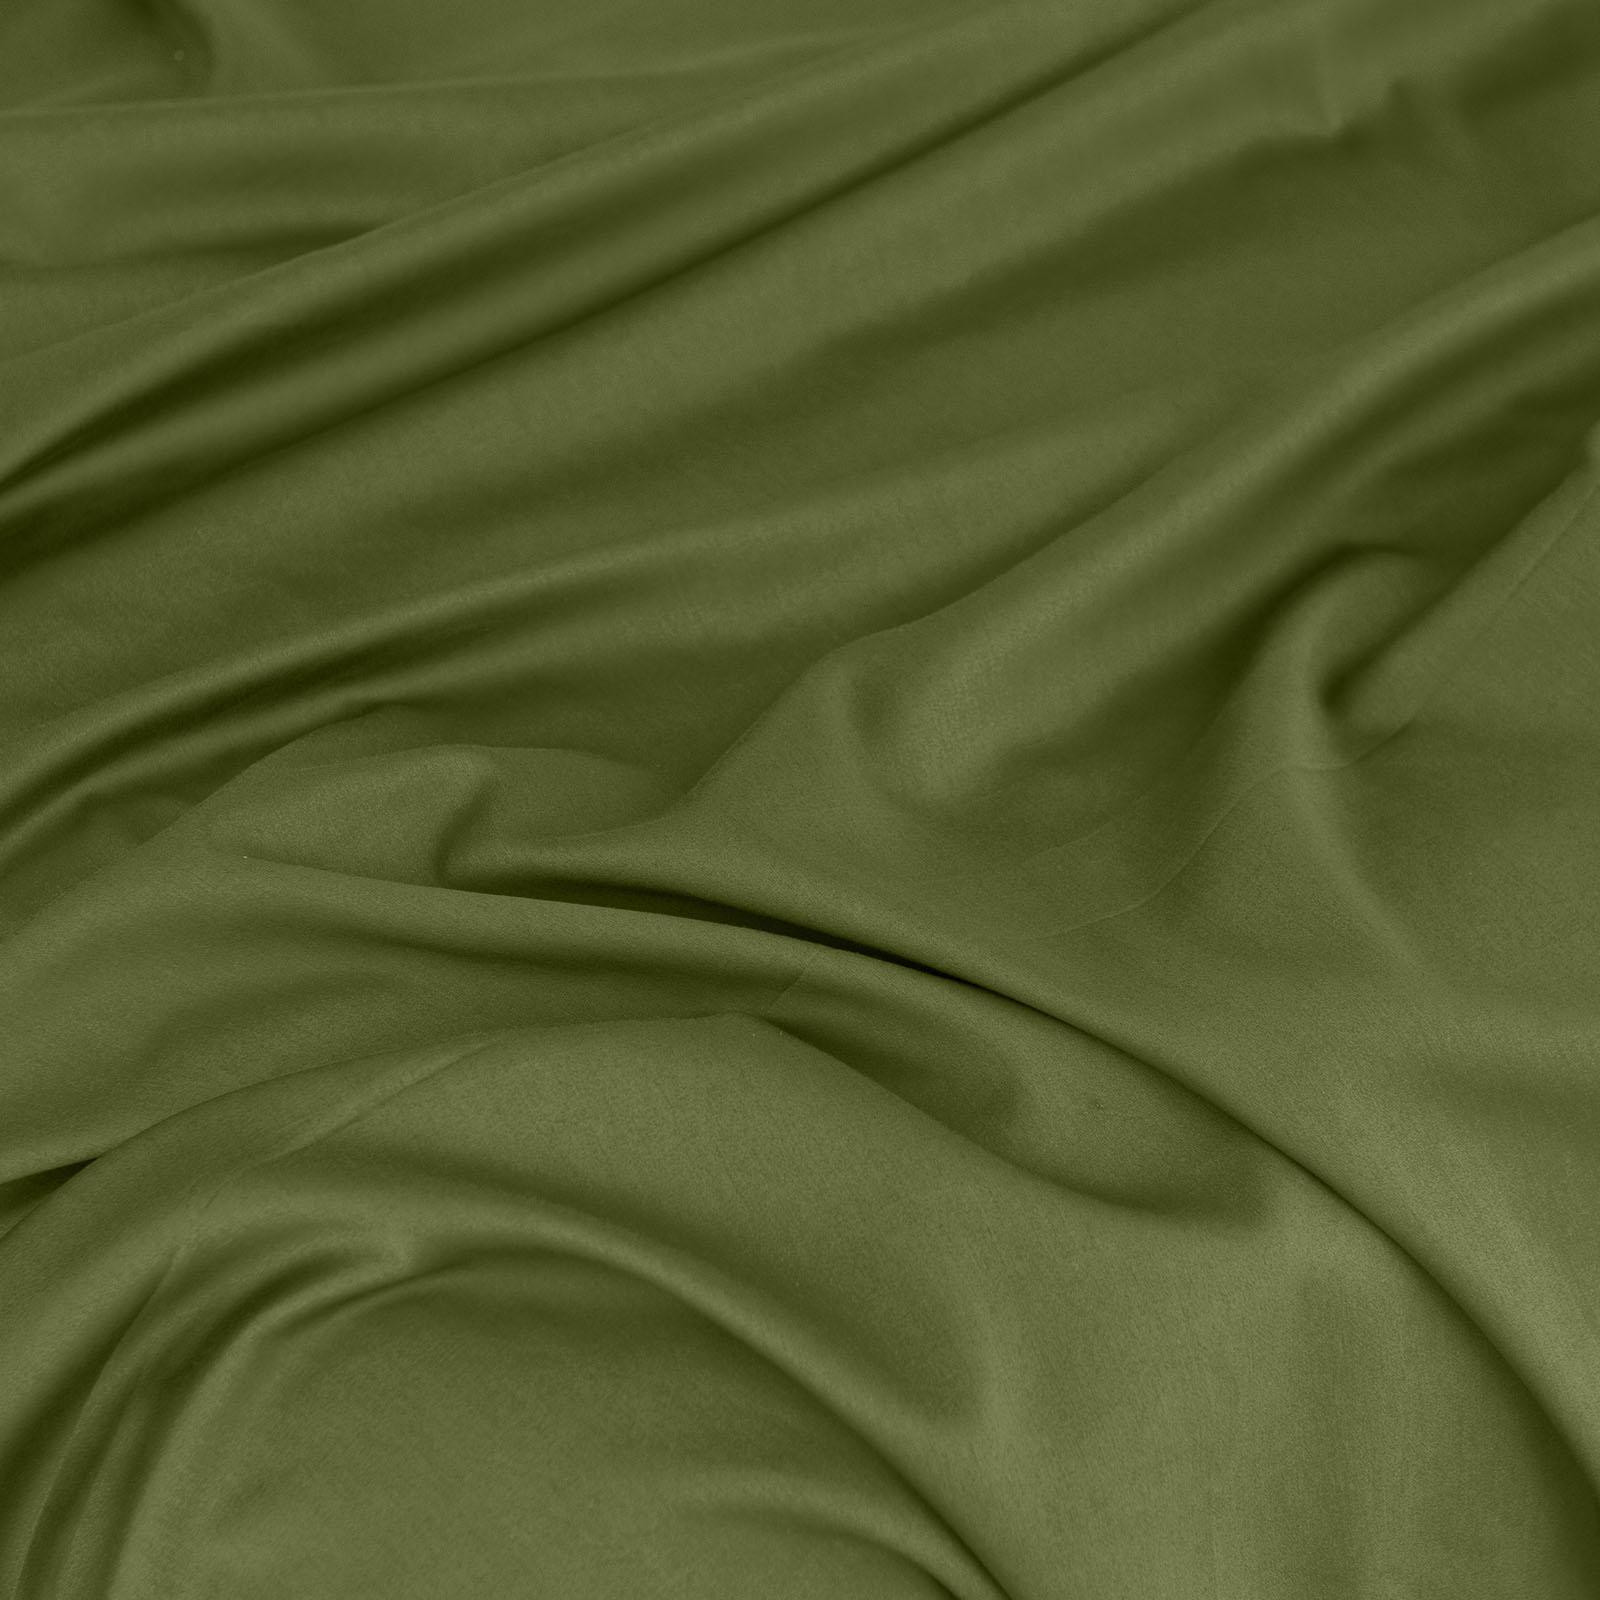 thumbnail 57 - Royal Comfort 1000TC Hotel Grade Bamboo Cotton Sheets Pillowcases Set Ultrasoft